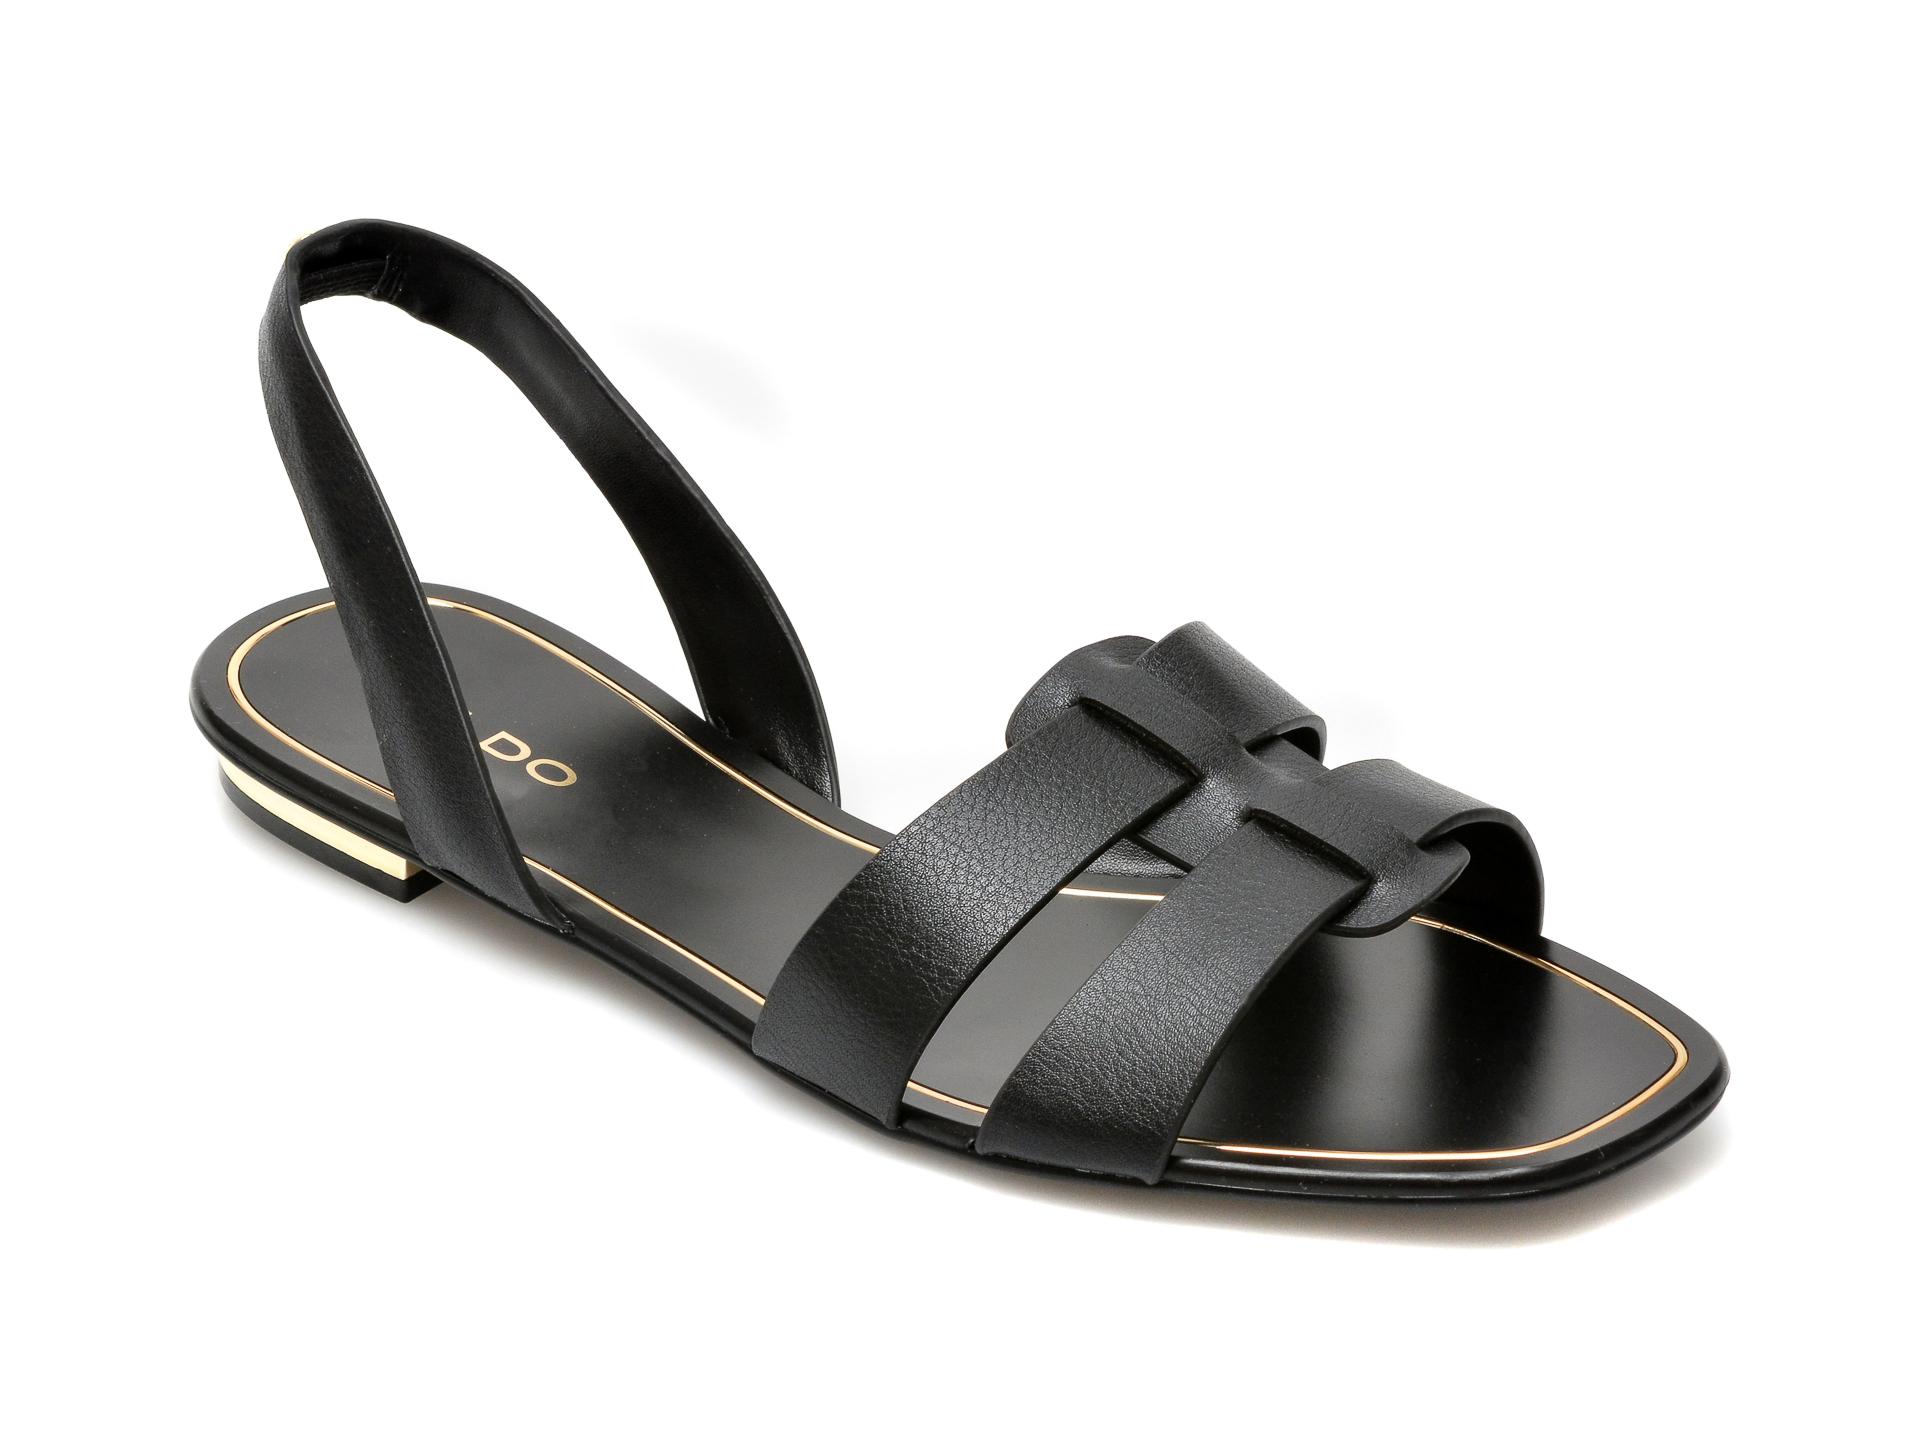 Sandale ALDO negre, Lothathiel001, din piele ecologica imagine otter.ro